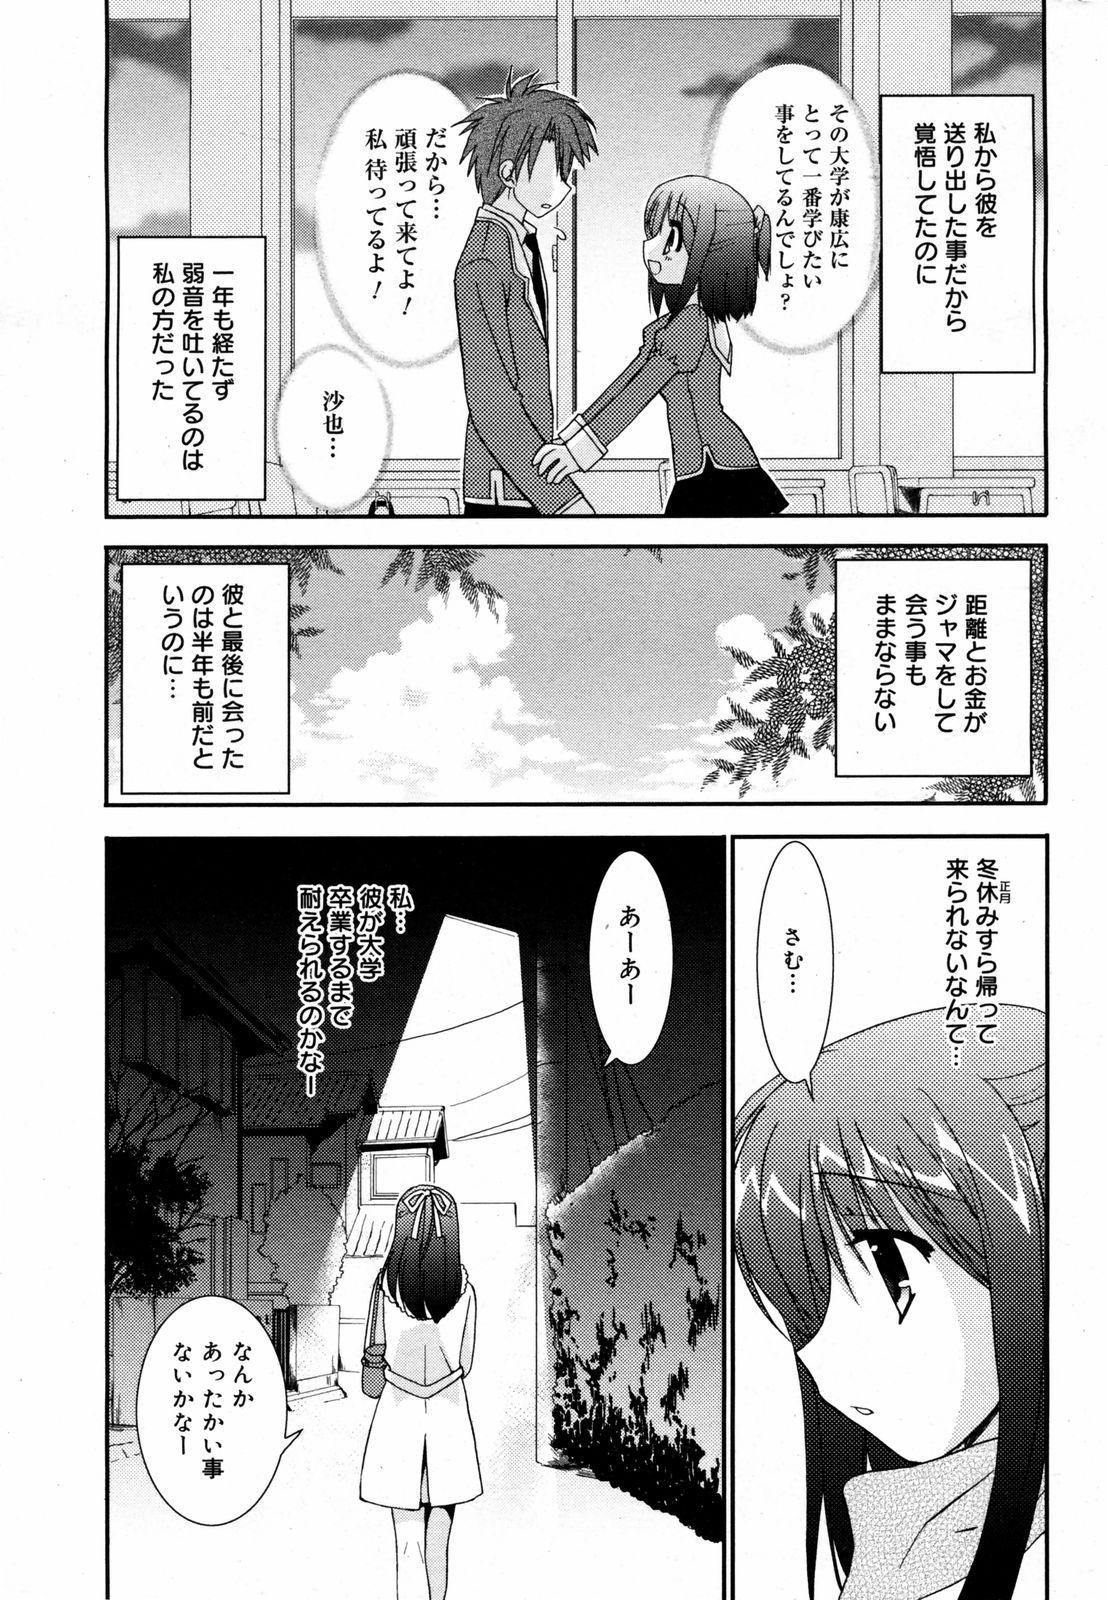 Manga Bangaichi 2008-03 10